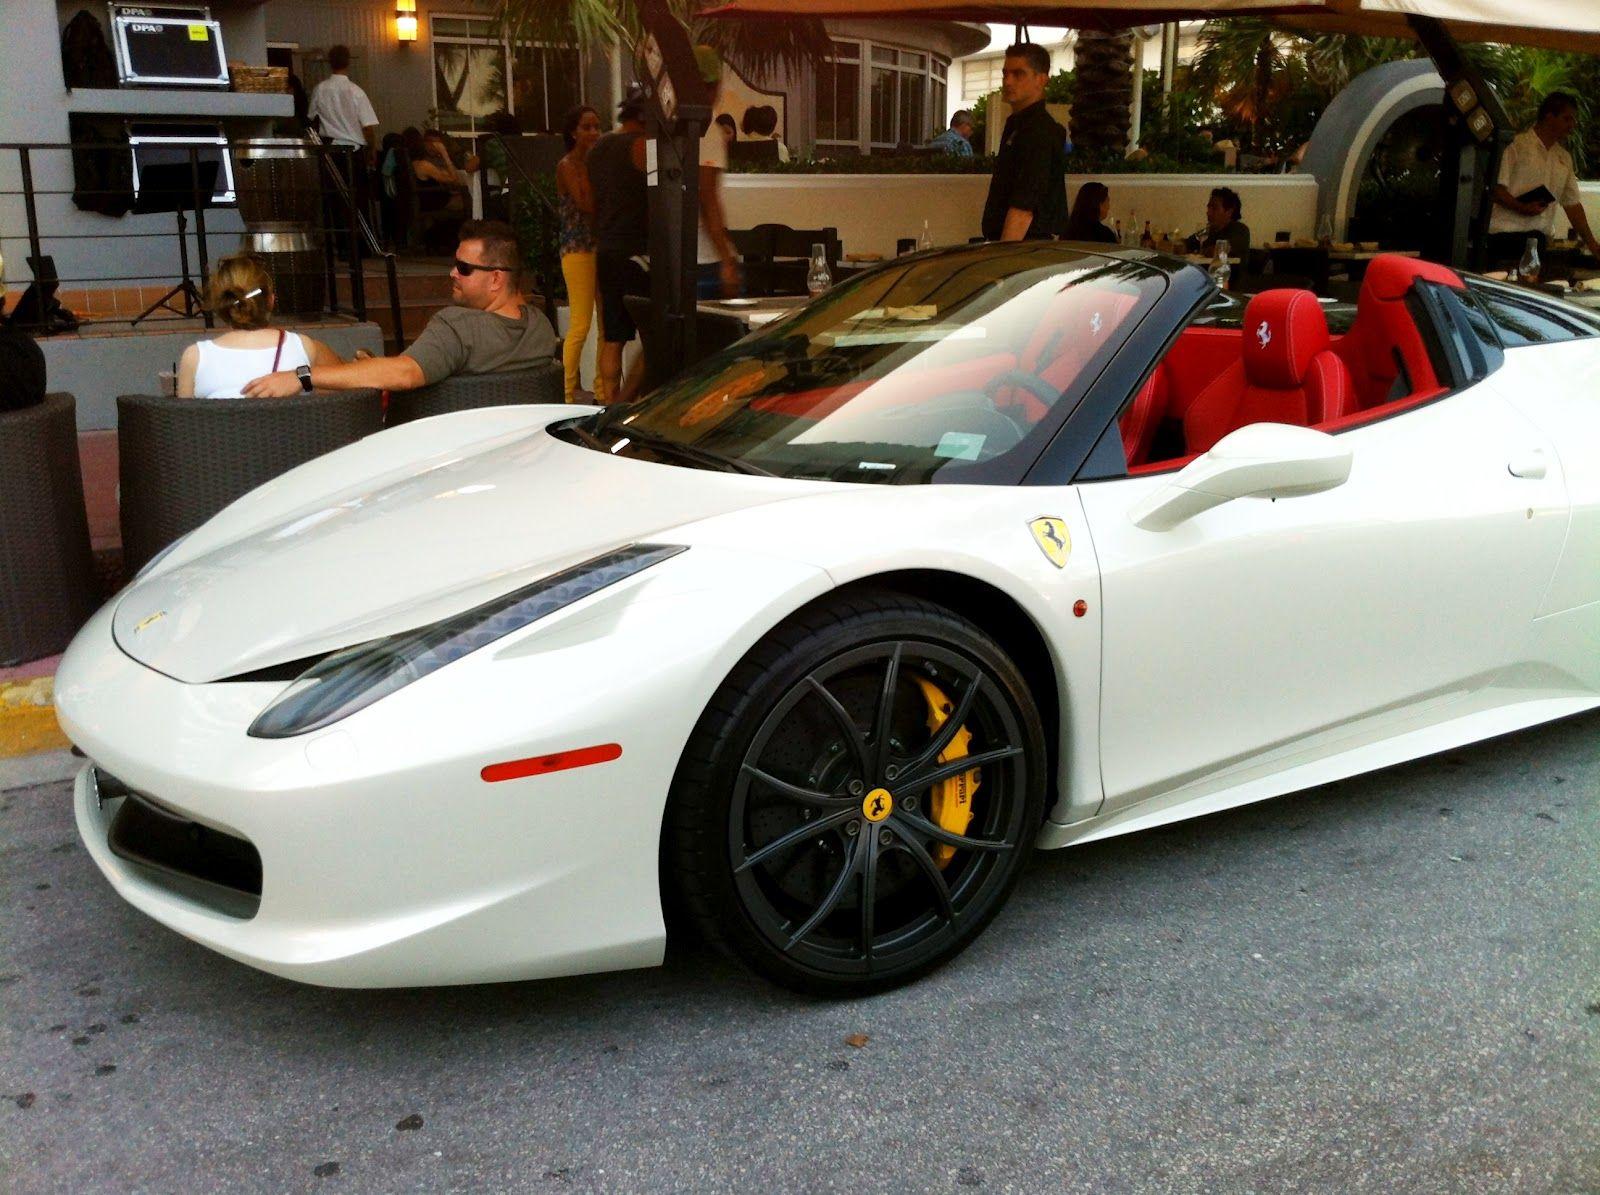 Ferrari 458 Spider White, black rims, red rims. DREAM CAR!!!